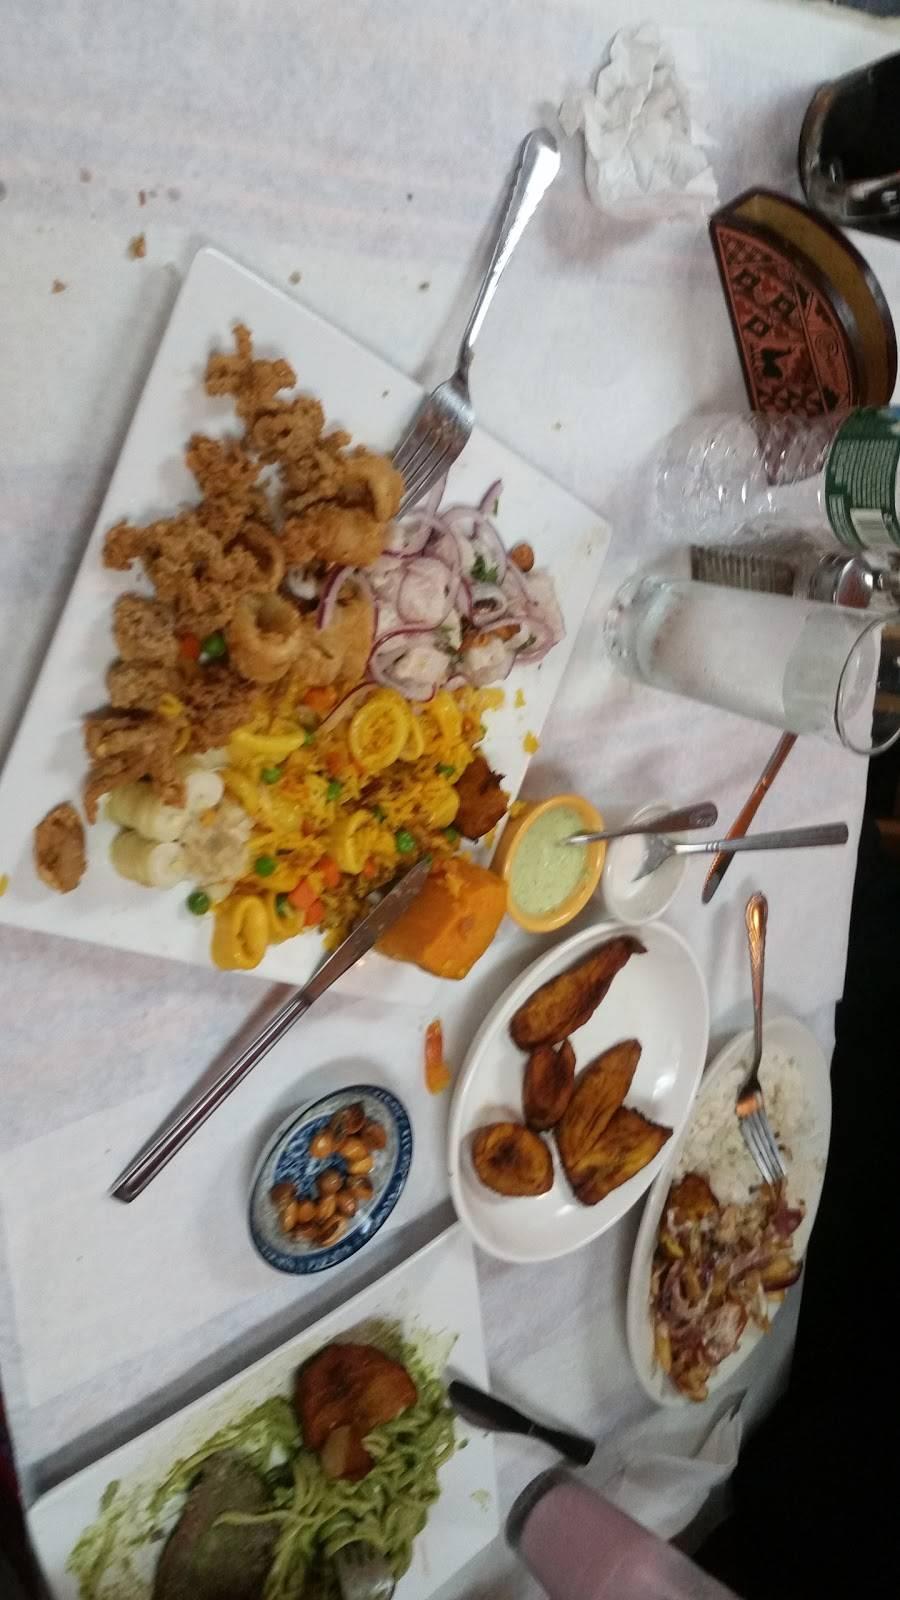 El Rincon Peruano | restaurant | 64-06 Roosevelt Ave, Woodside, NY 11377, USA | 7184245298 OR +1 718-424-5298